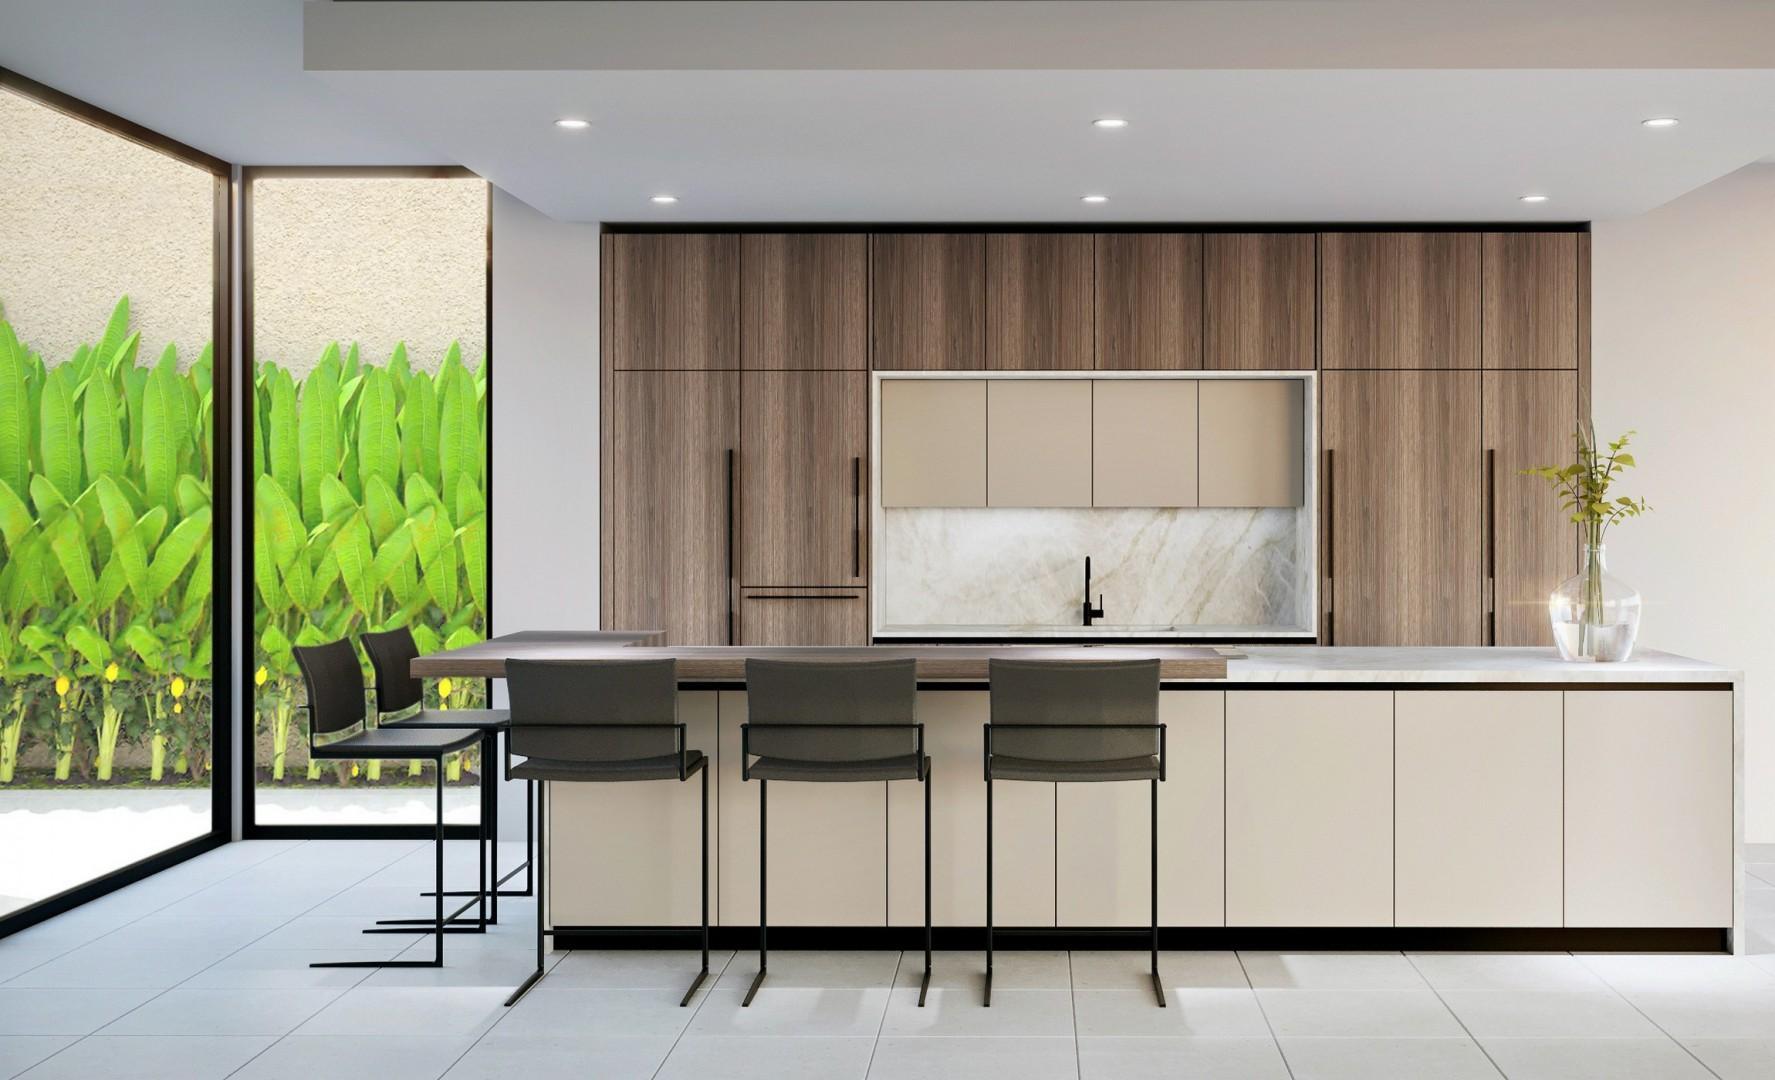 Fully-stocked gourmet kitchen